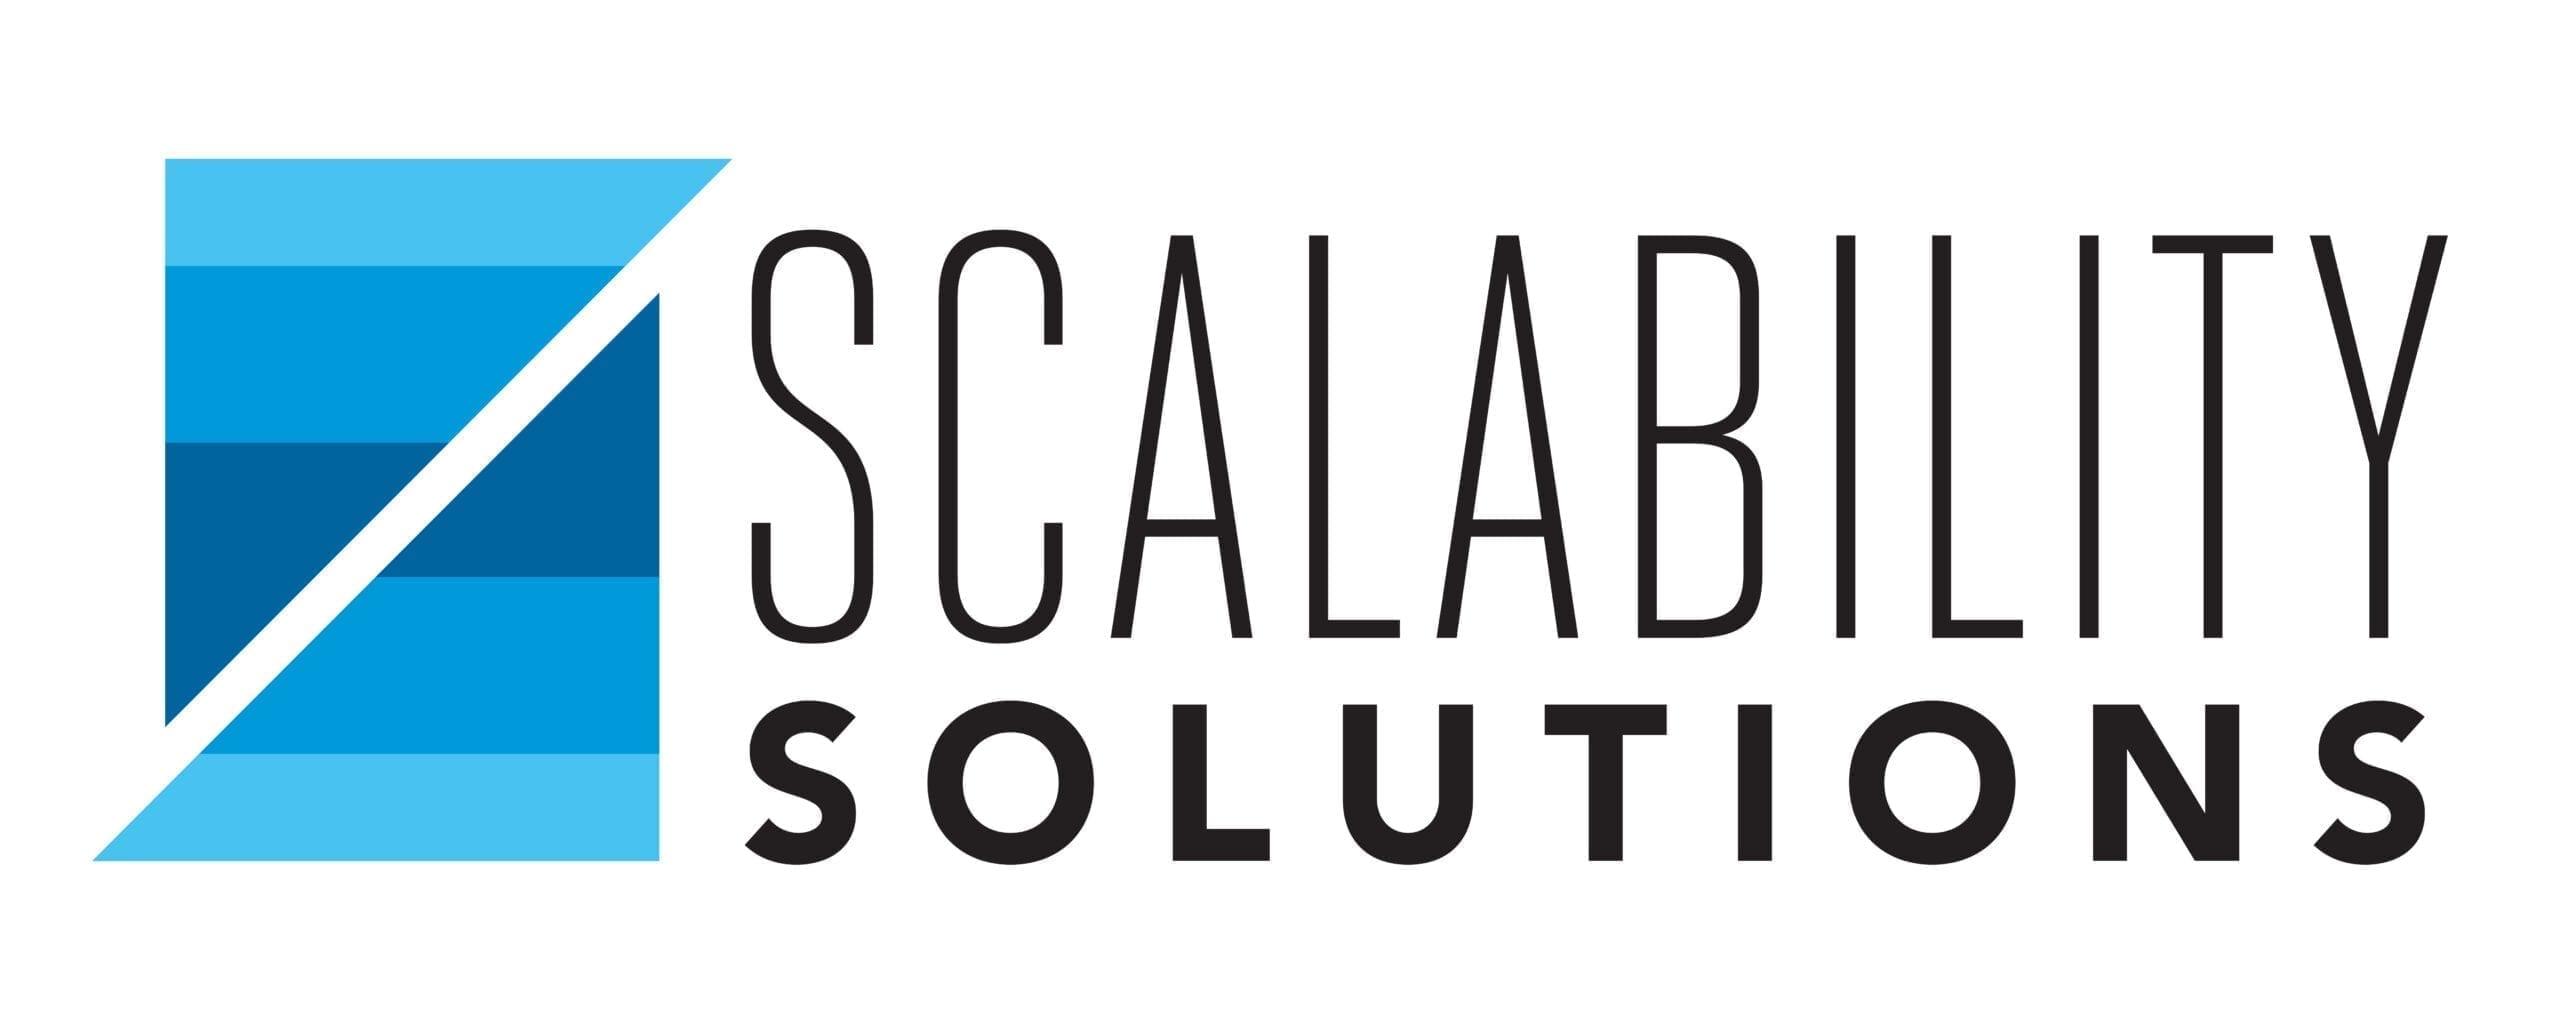 Scalability Solutions LLC